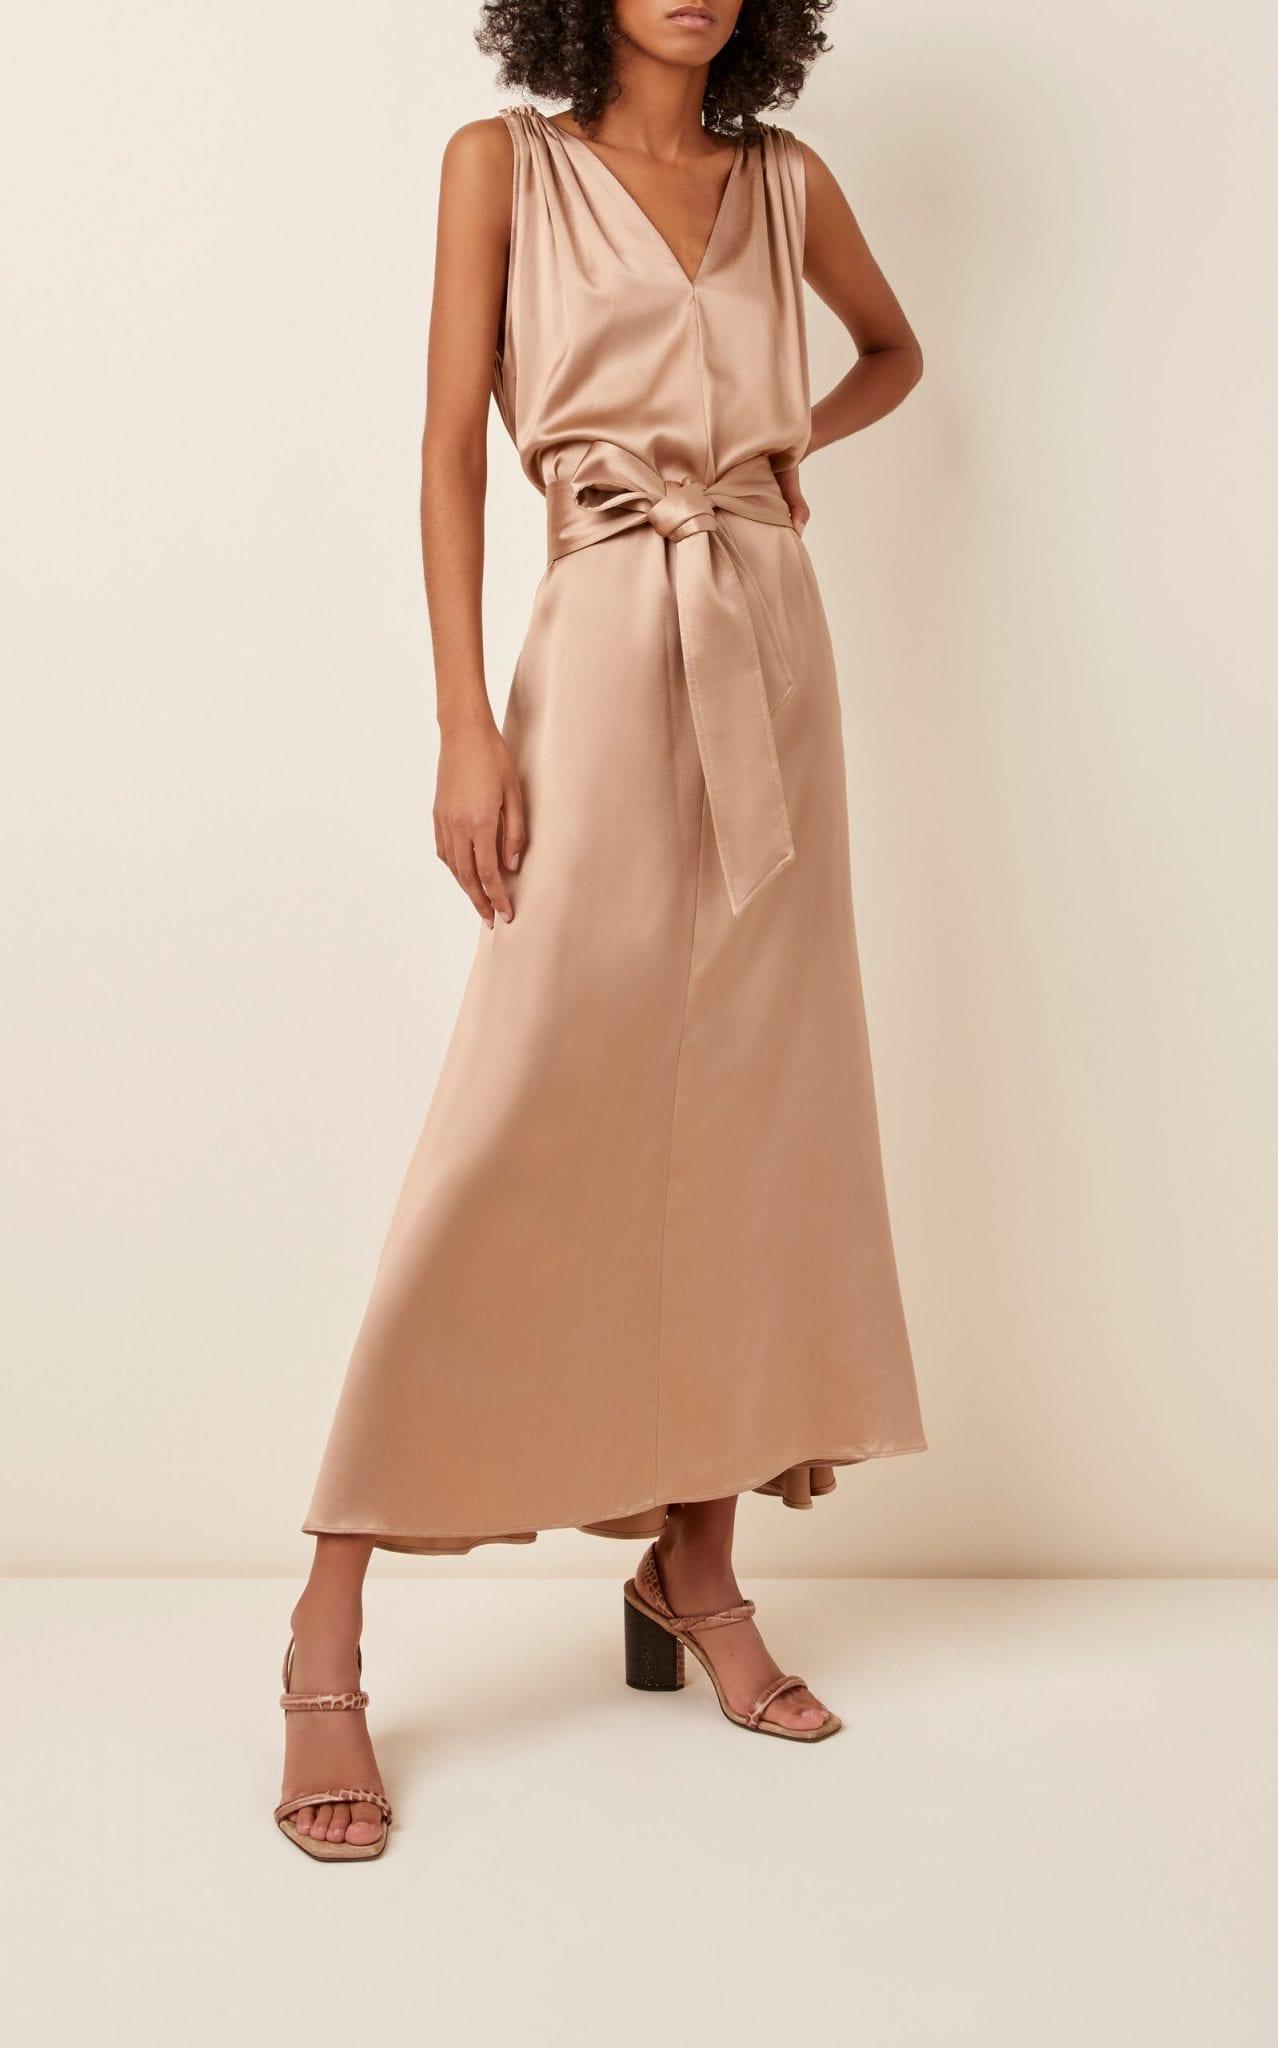 BRUNELLO CUCINELLI Statin Double-V Dress